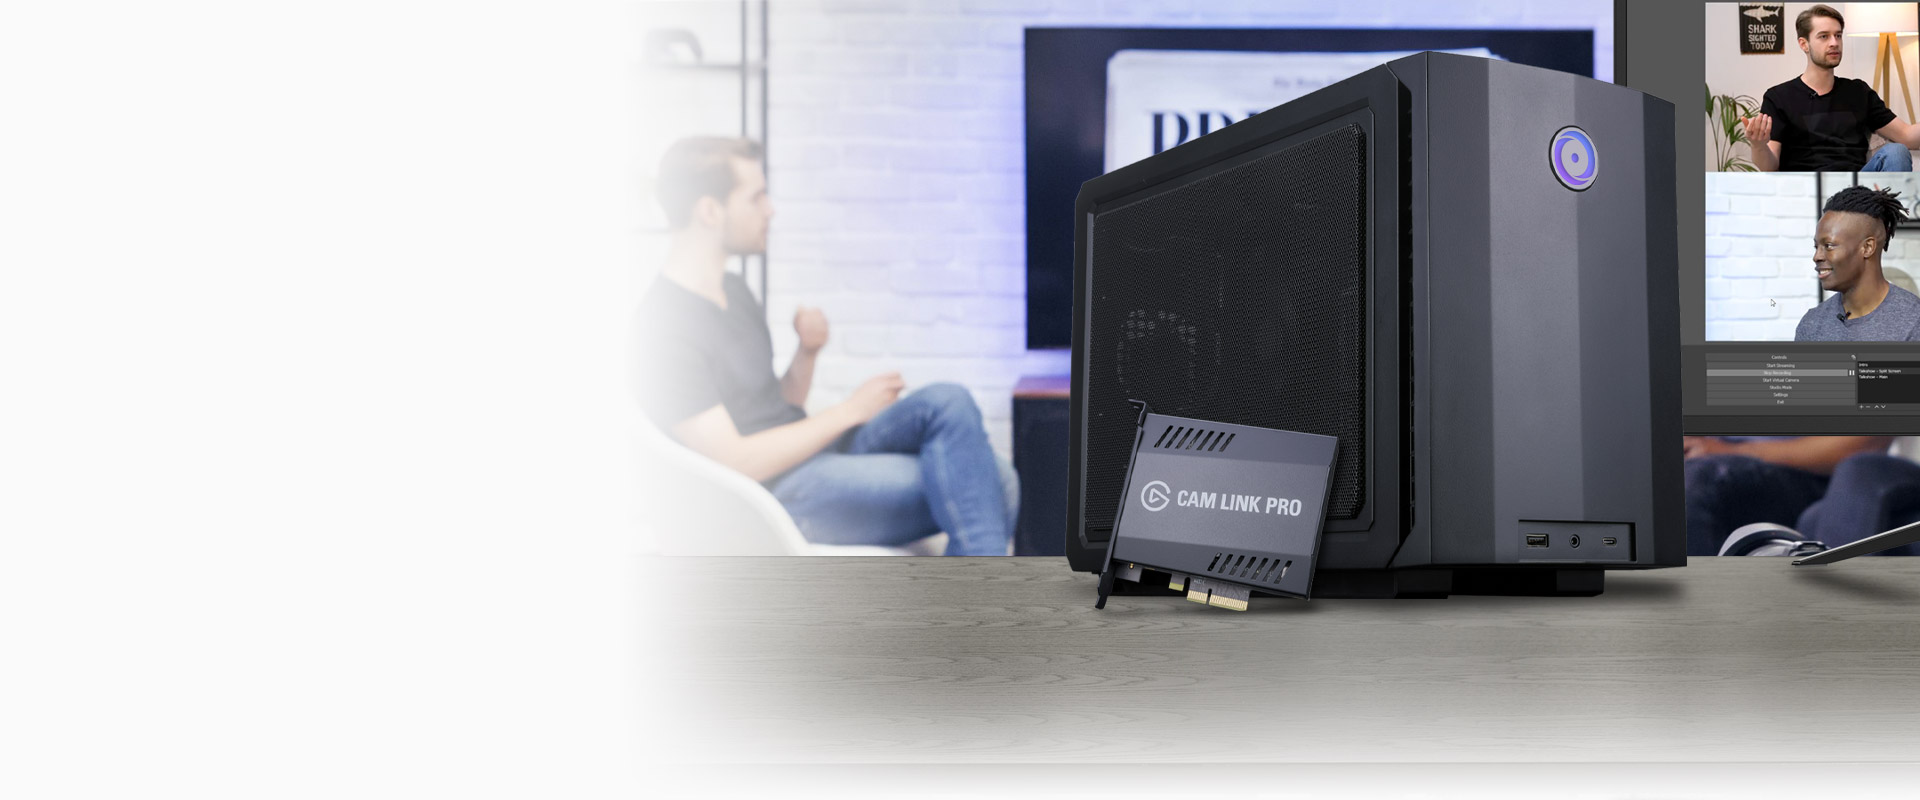 S-CLASS Cam Link Pro